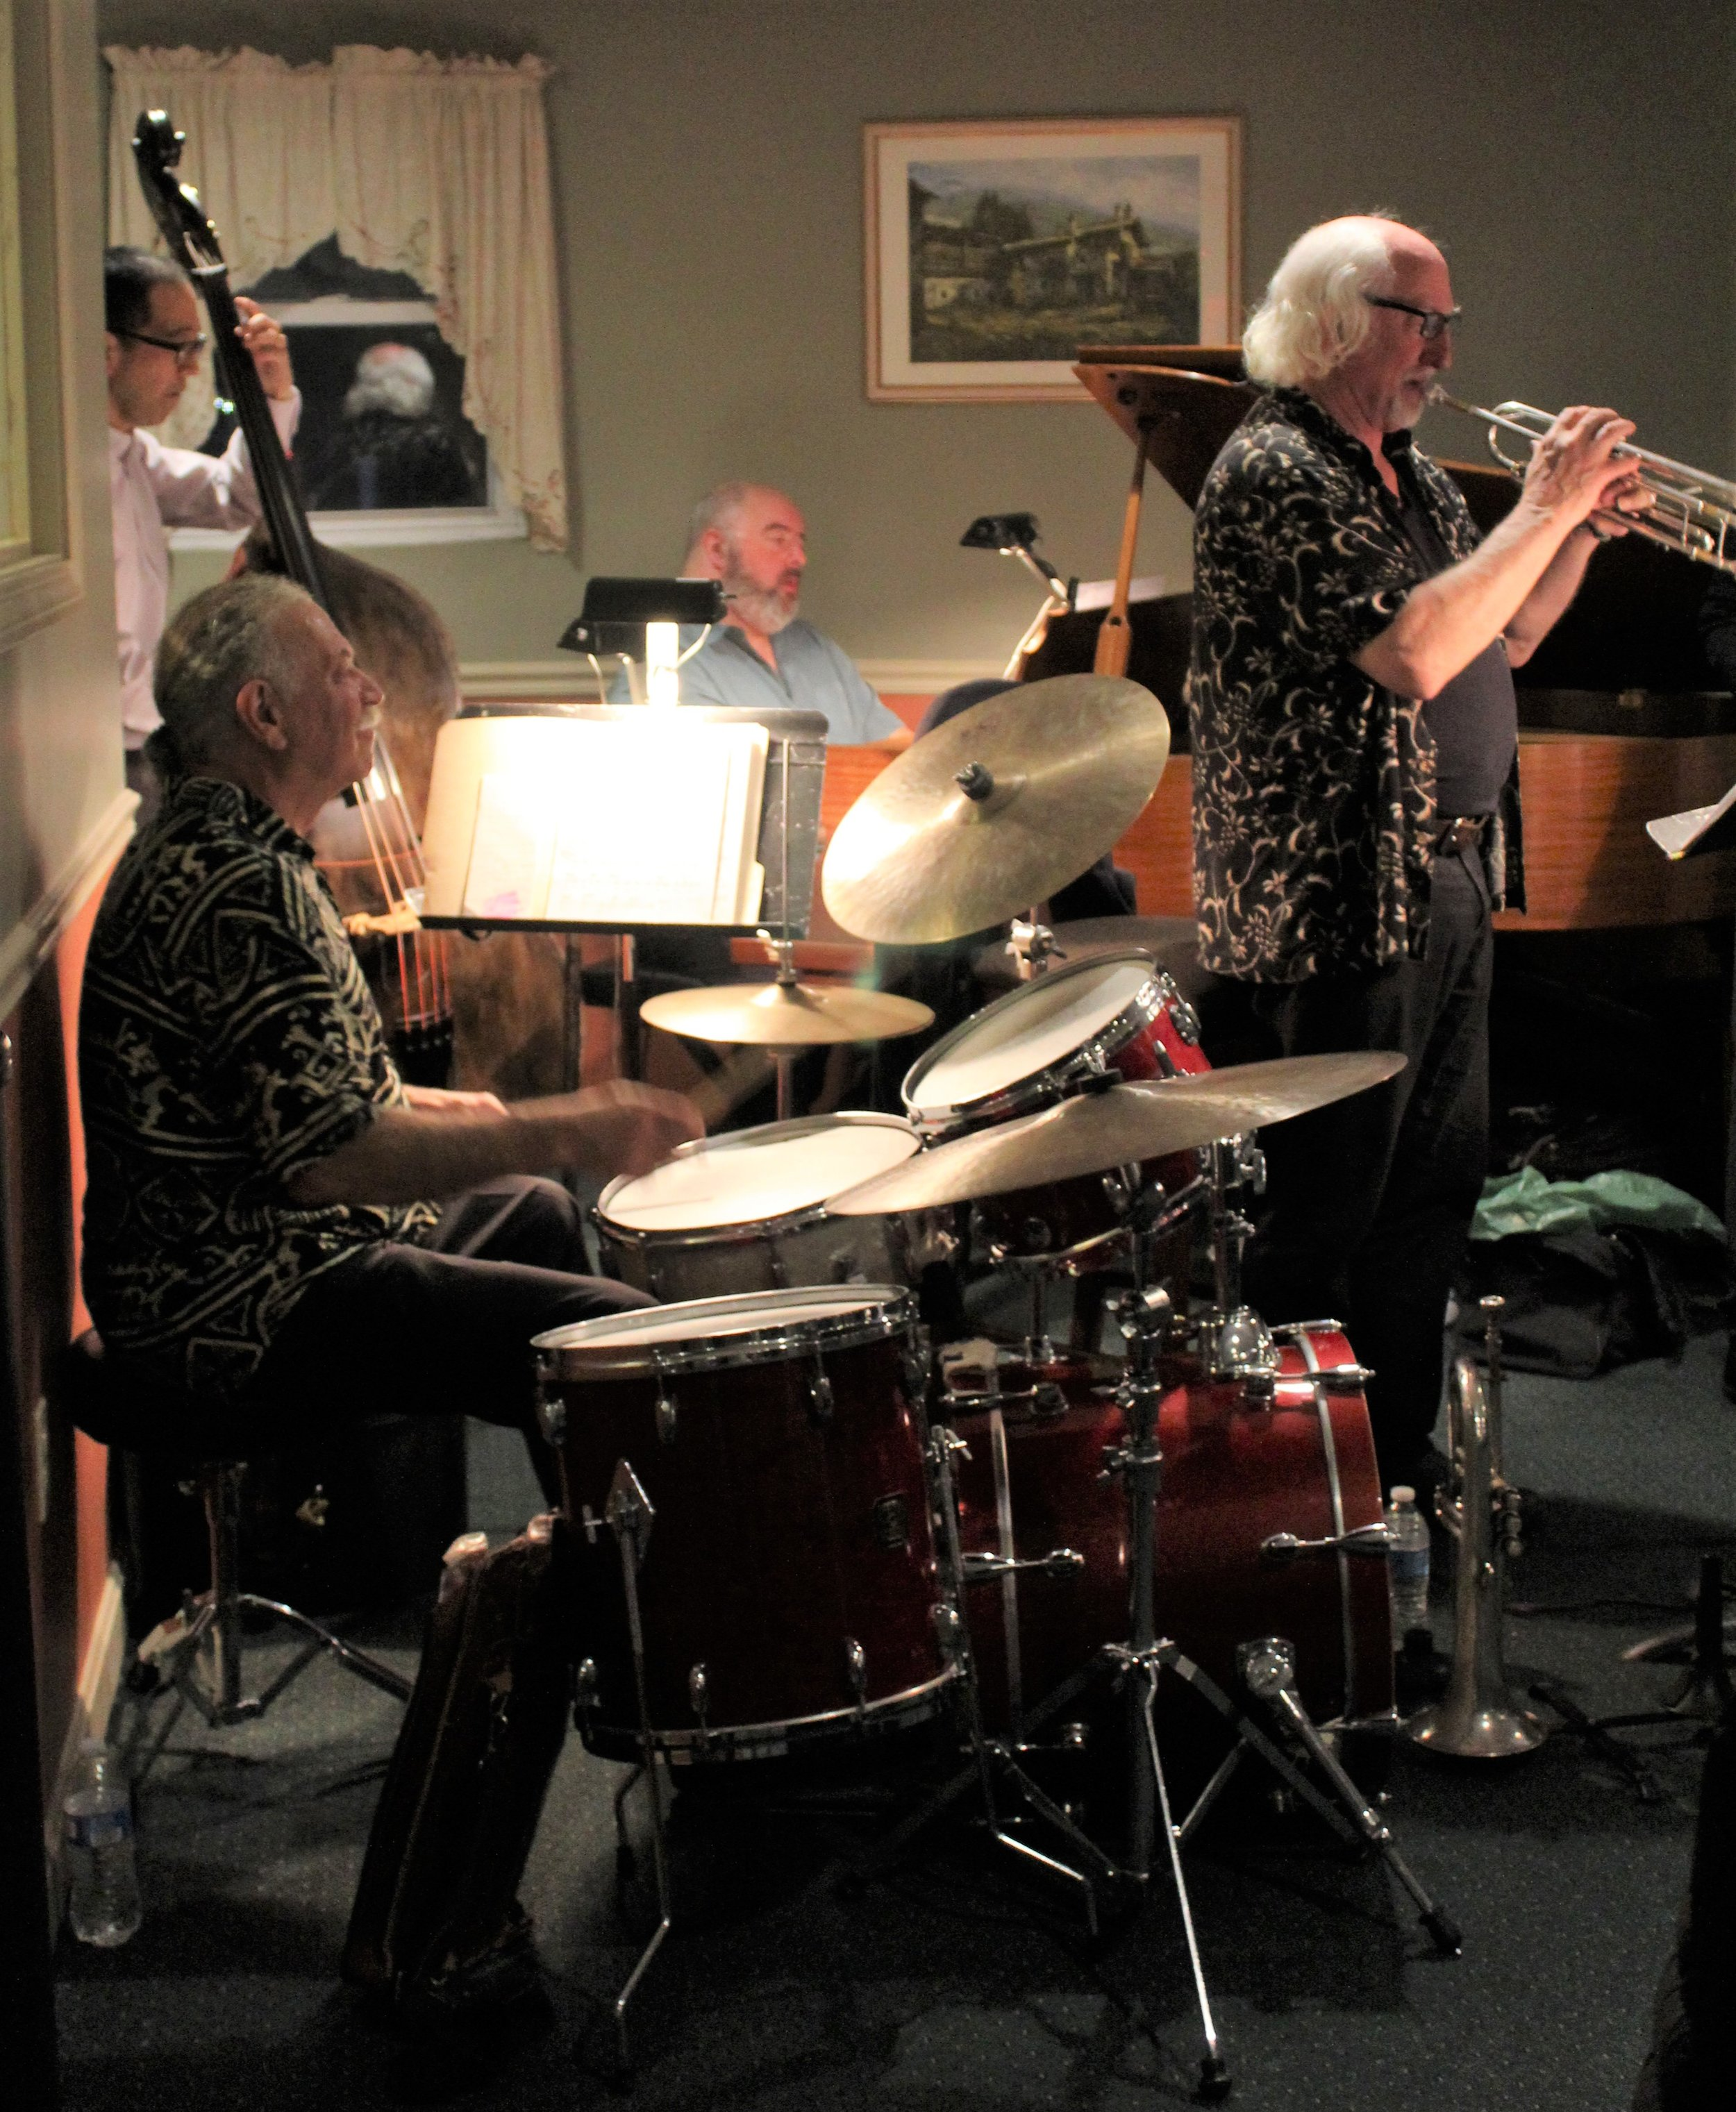 Bobby Tamagni on Drums